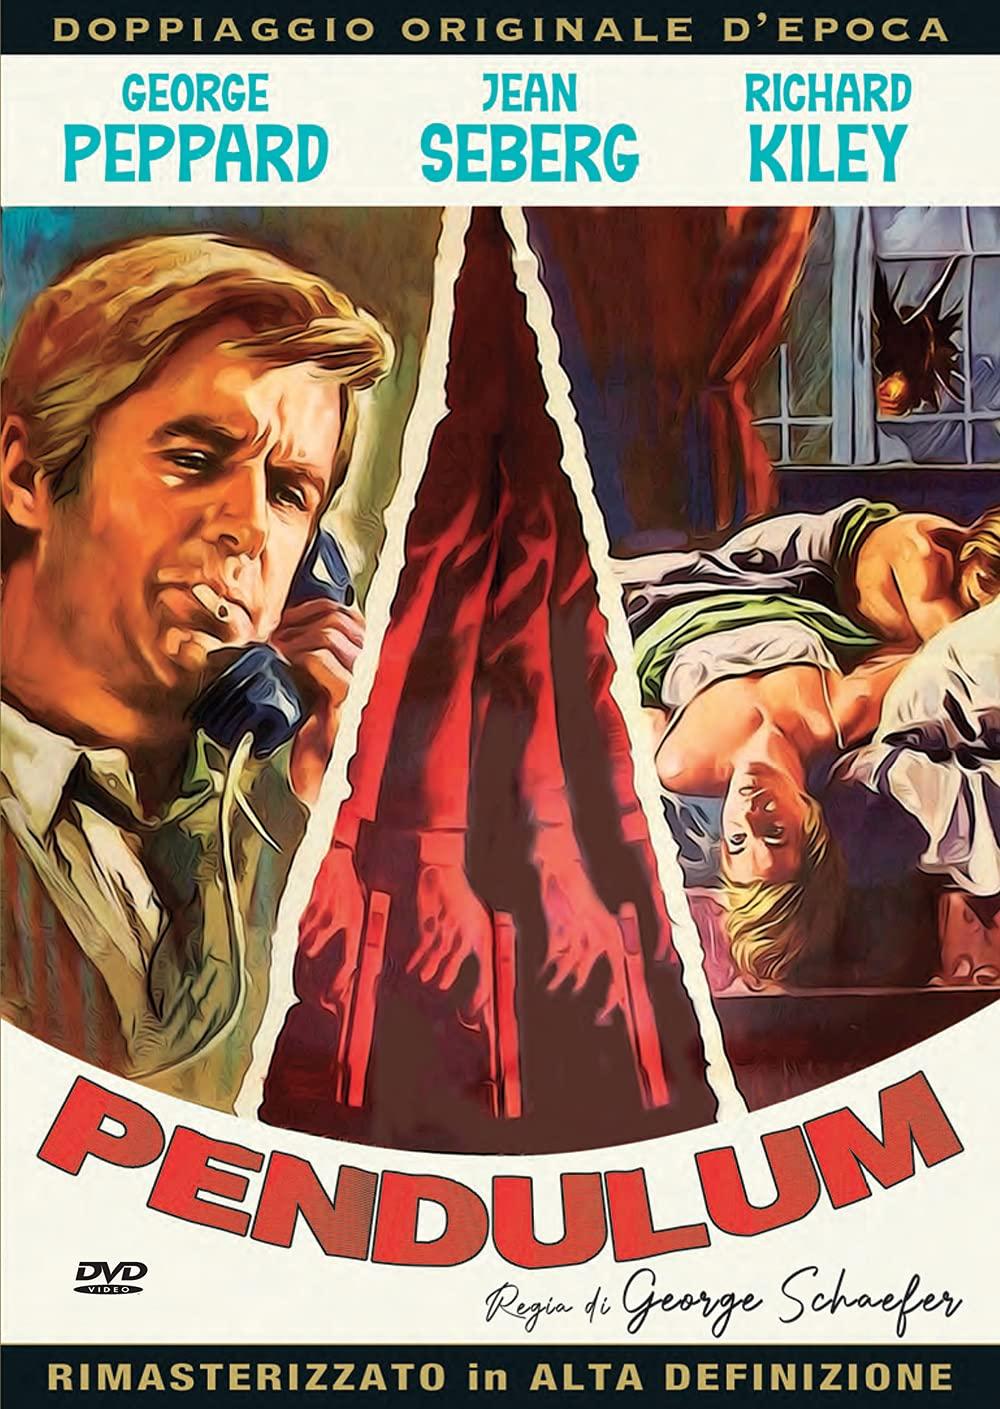 PENDULUM (DVD)